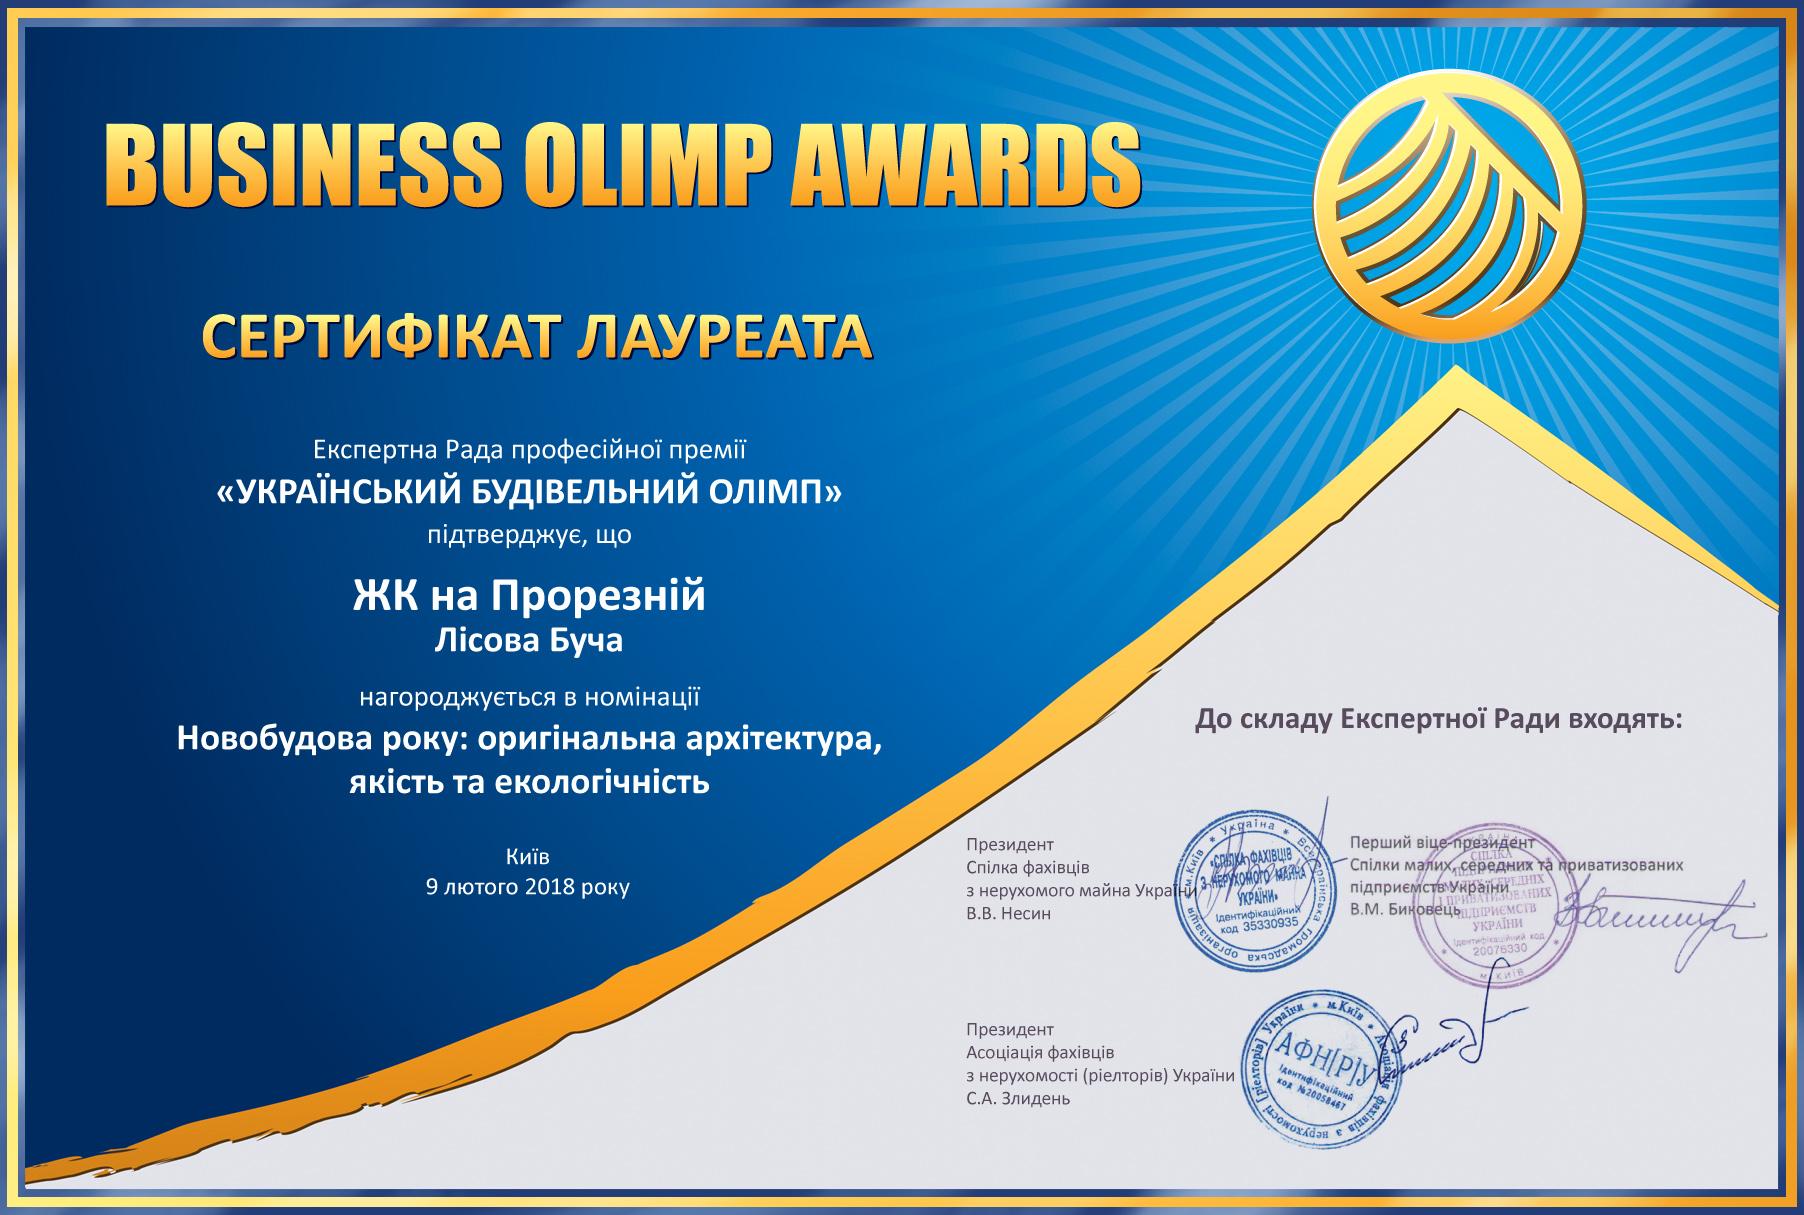 сертифікат лауреата